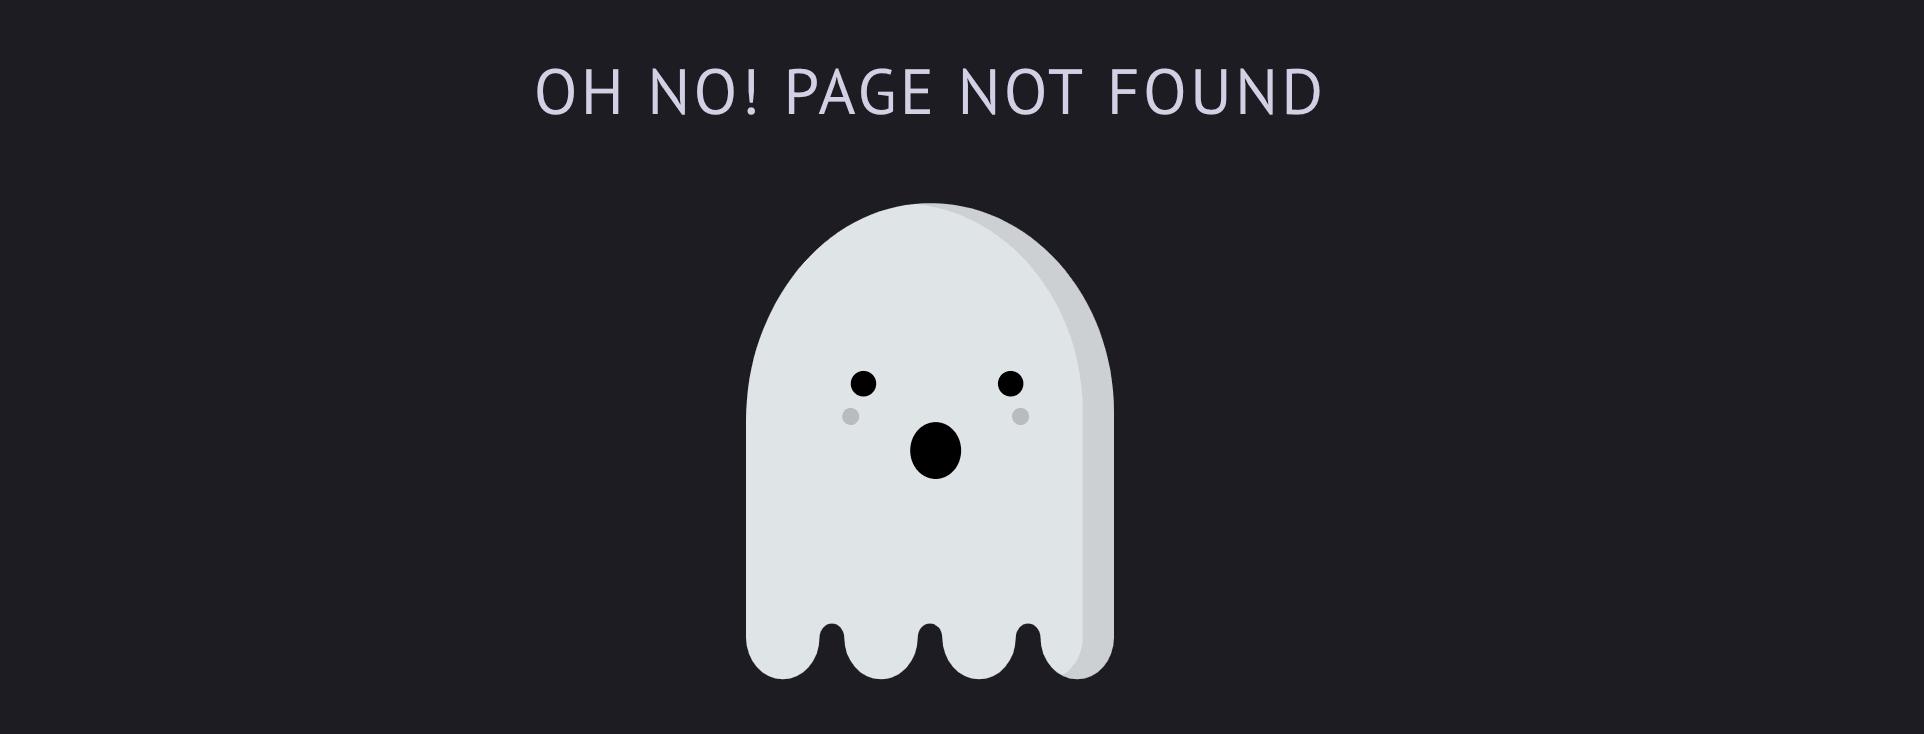 My 404 page illustration